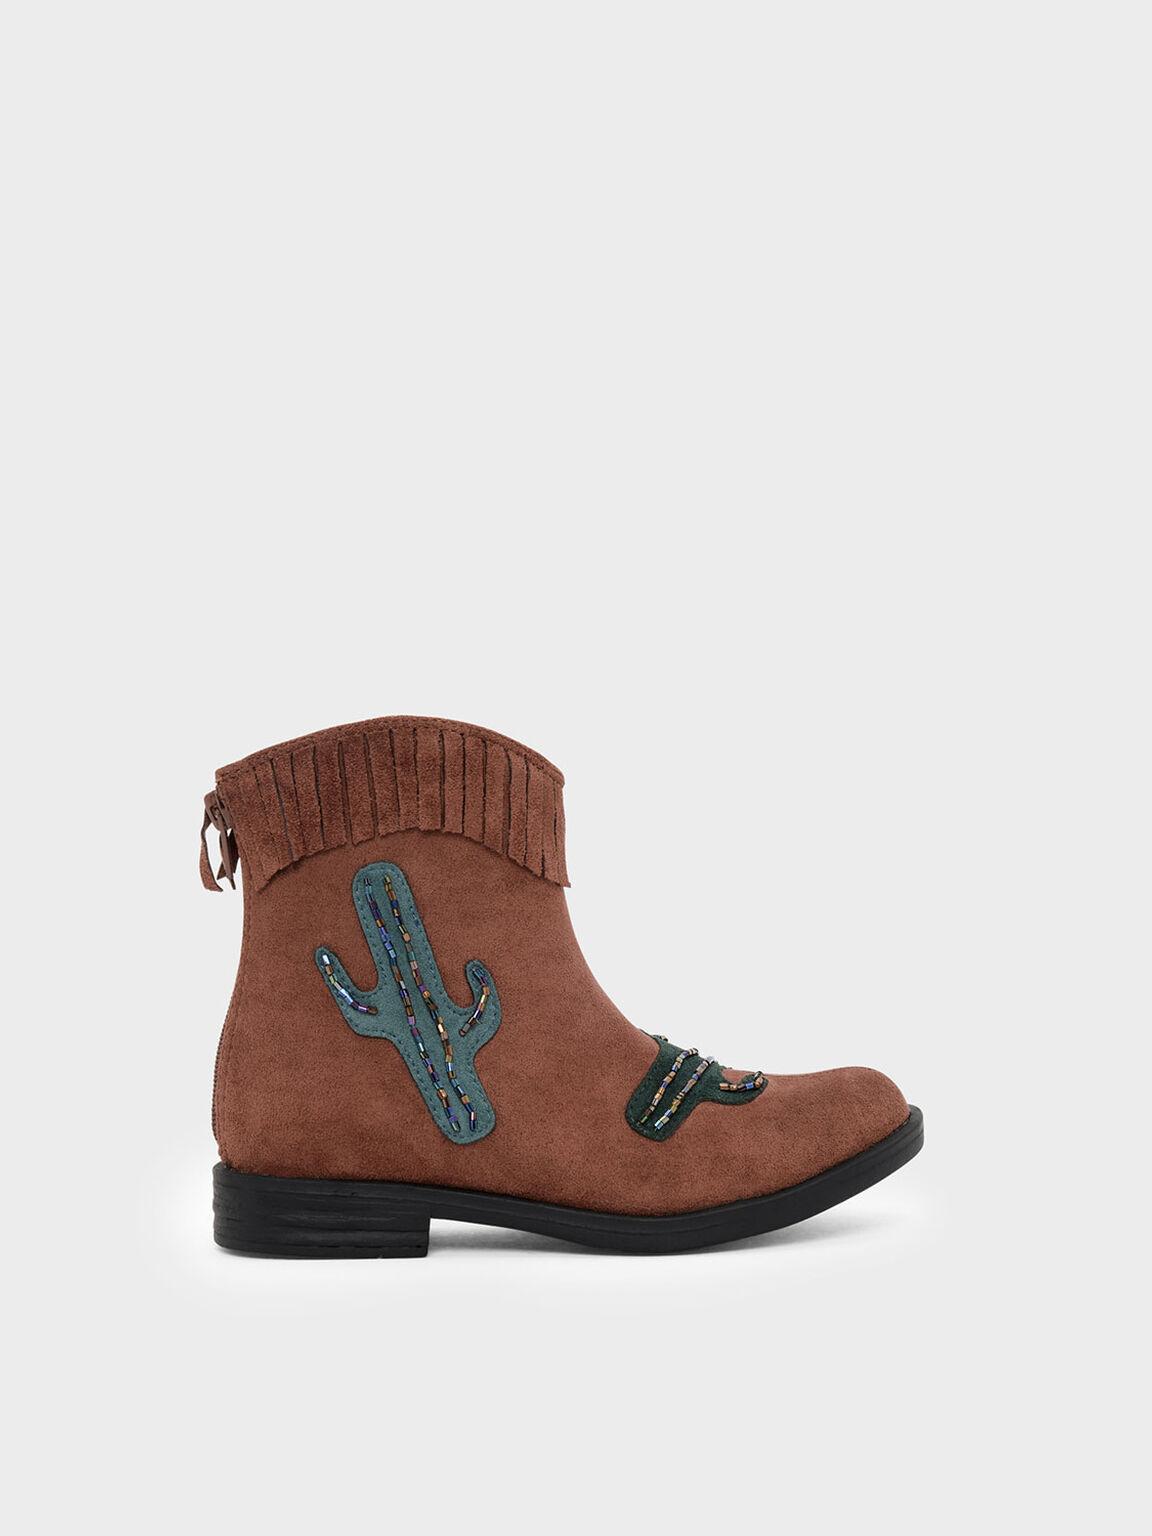 Kids Cactus Detail Boots, Brown, hi-res